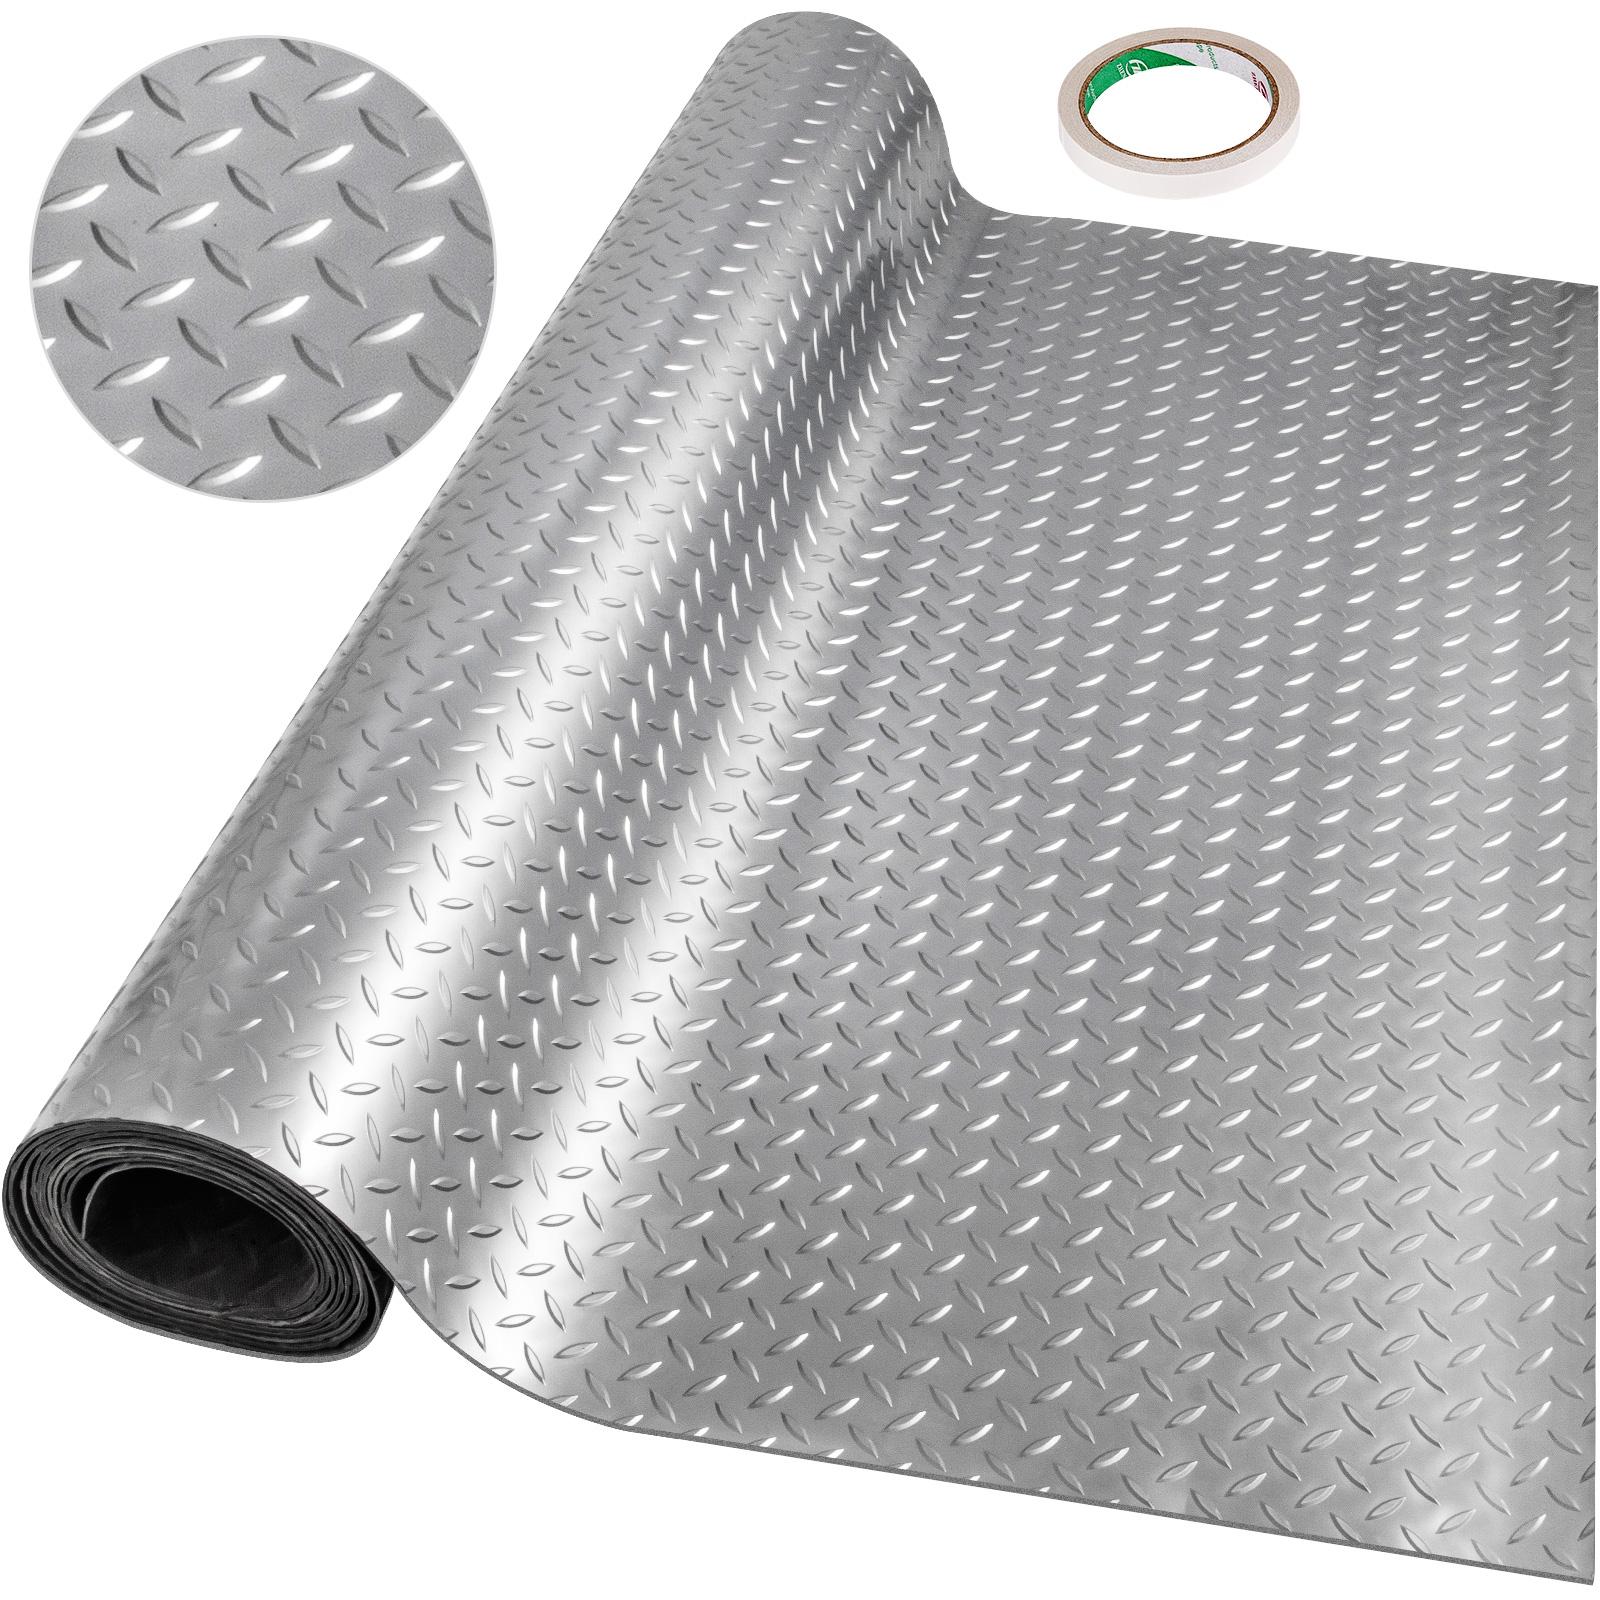 thumbnail 61 - Garage Flooring Mat Roll Car Trailer Floor Covering 1.1m Width Gym Floor Roll